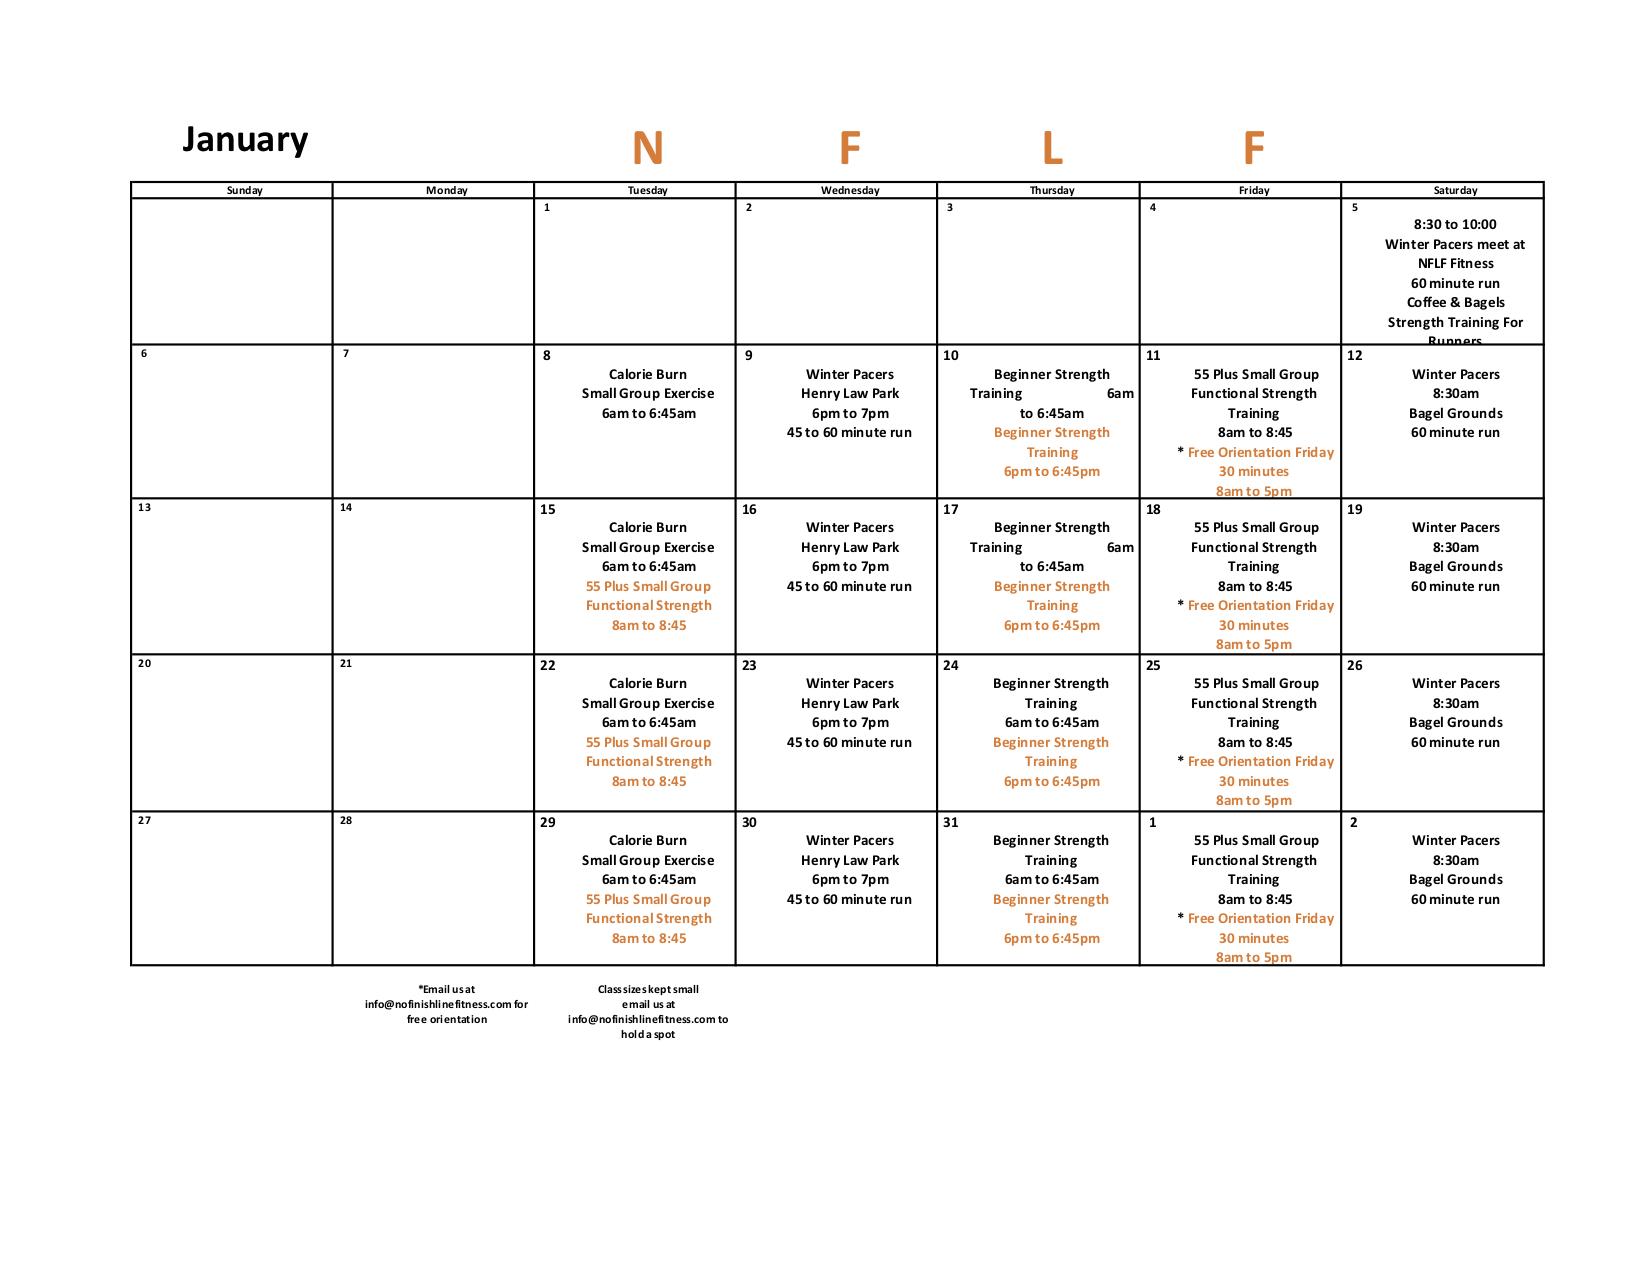 January 2019 Class Schedule